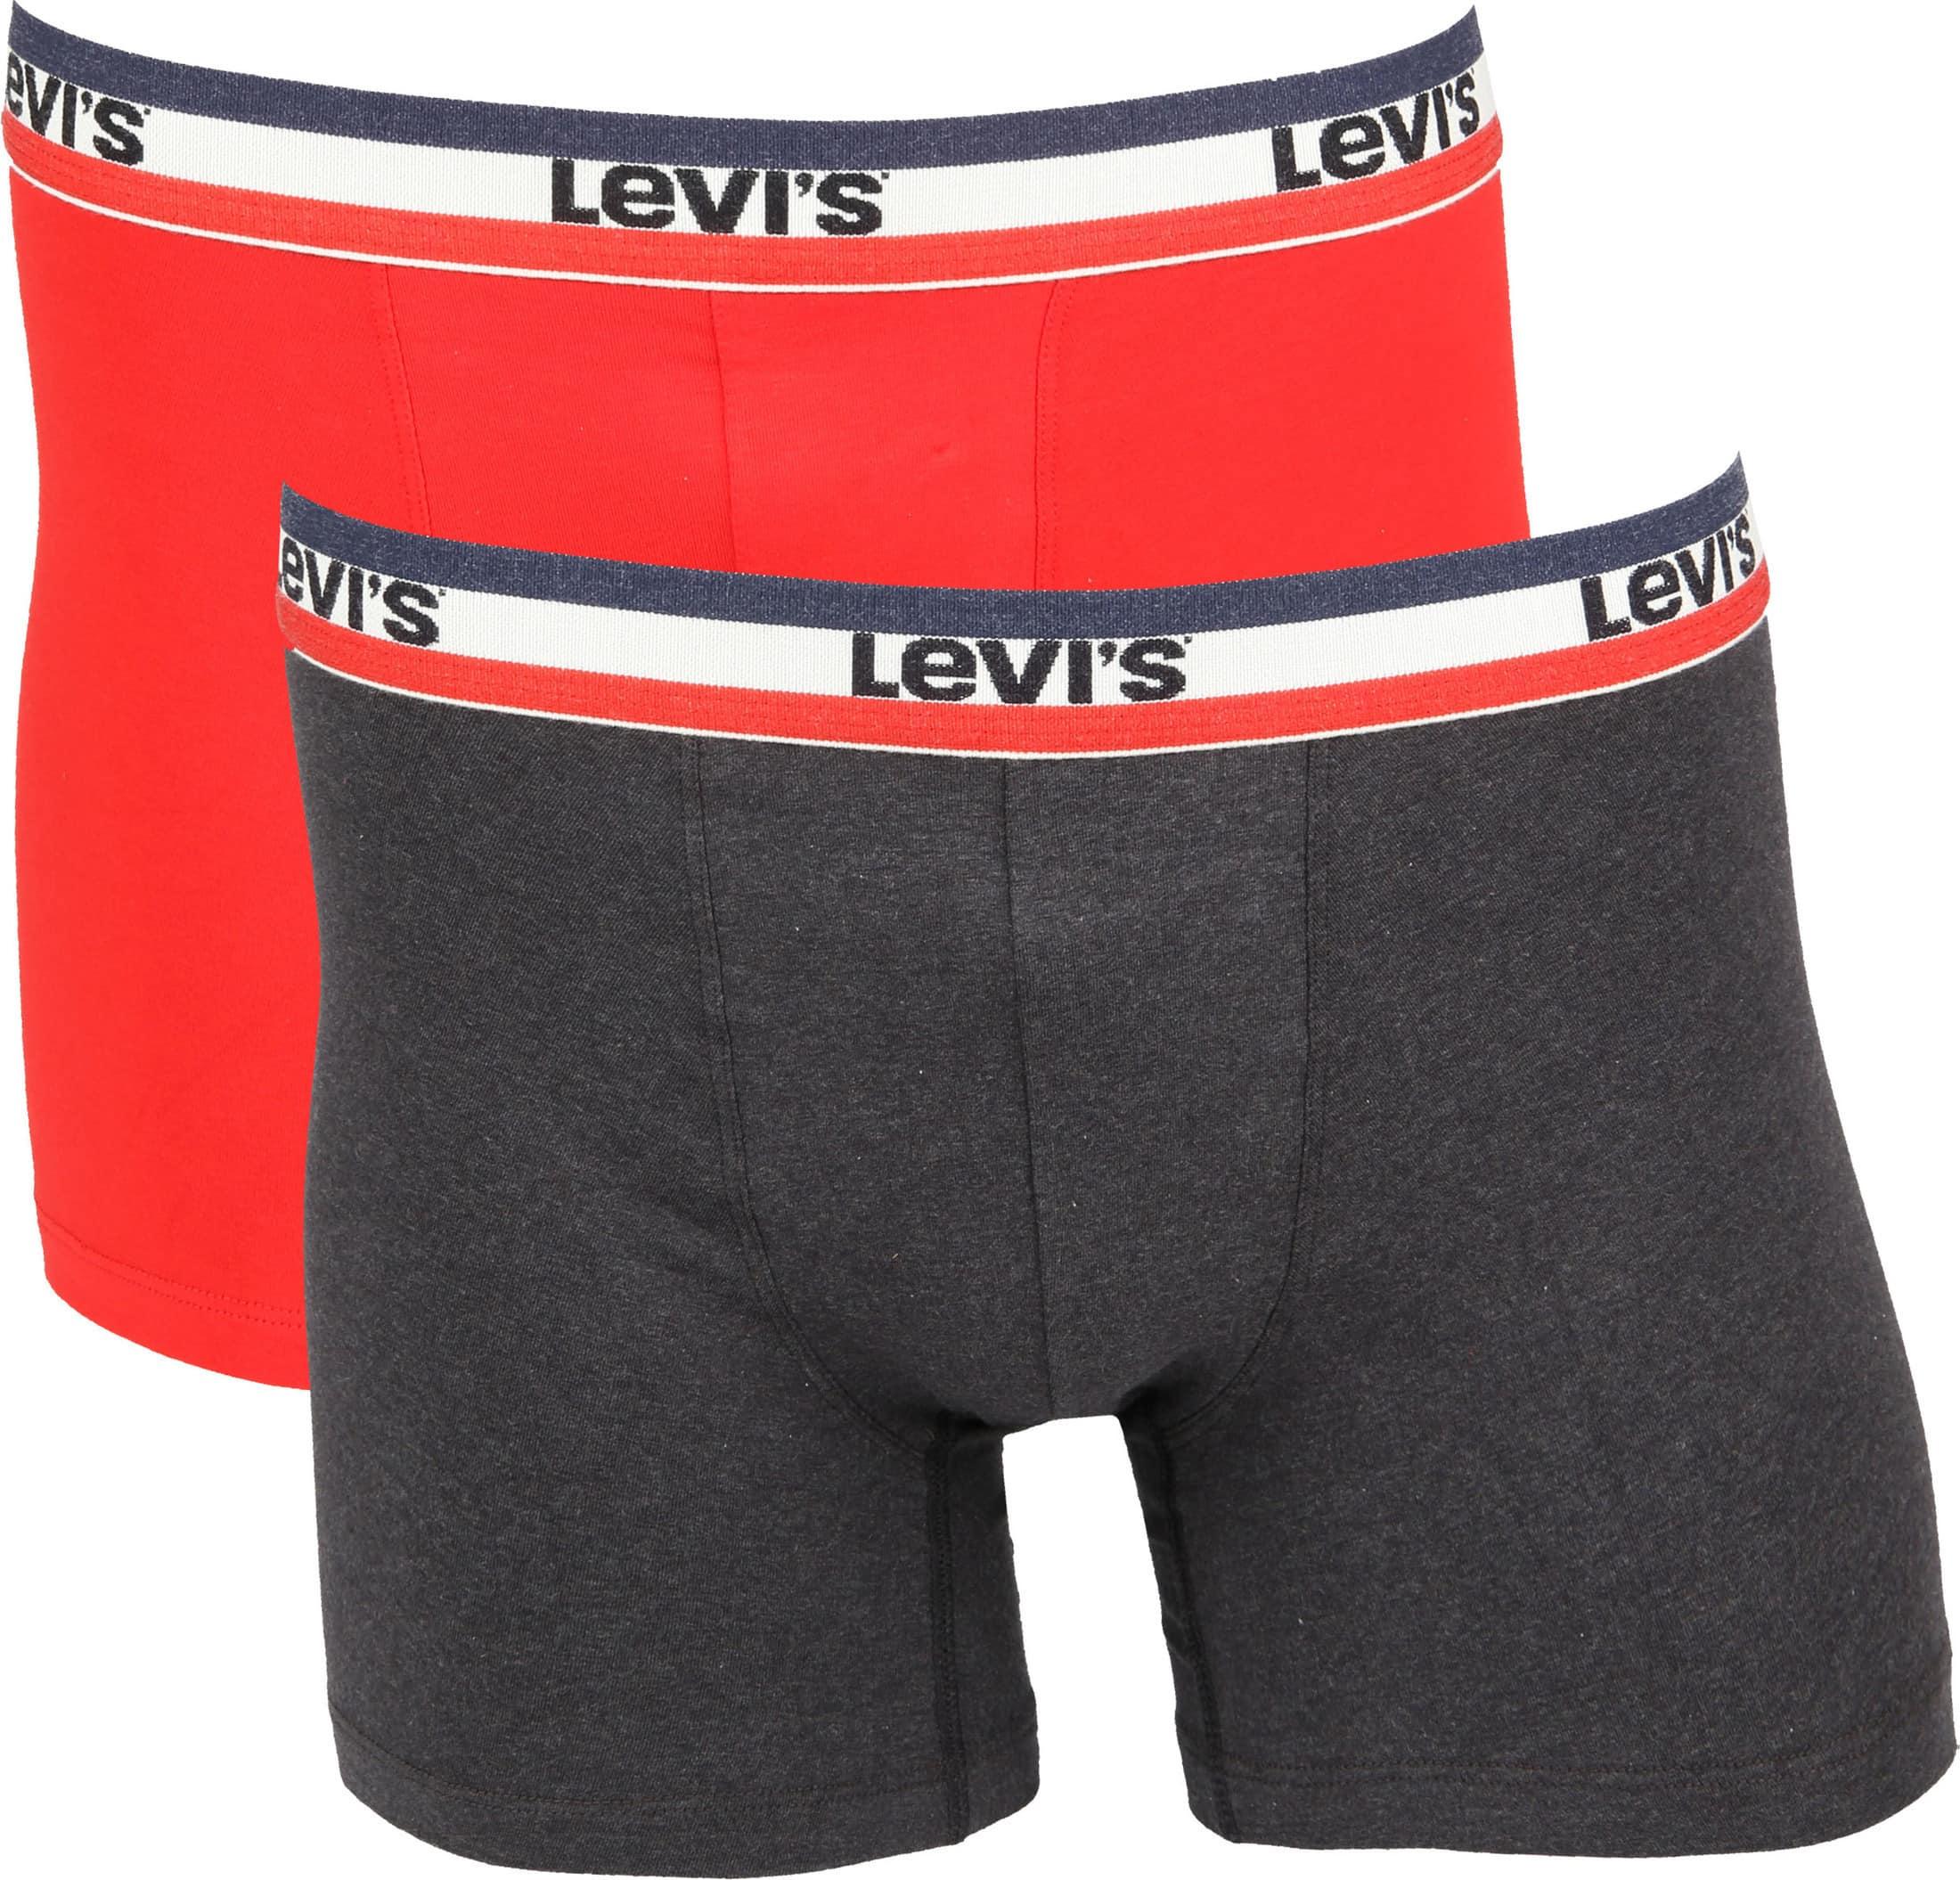 Levi's Boxershorts 2-Pack Rood Grijs foto 0